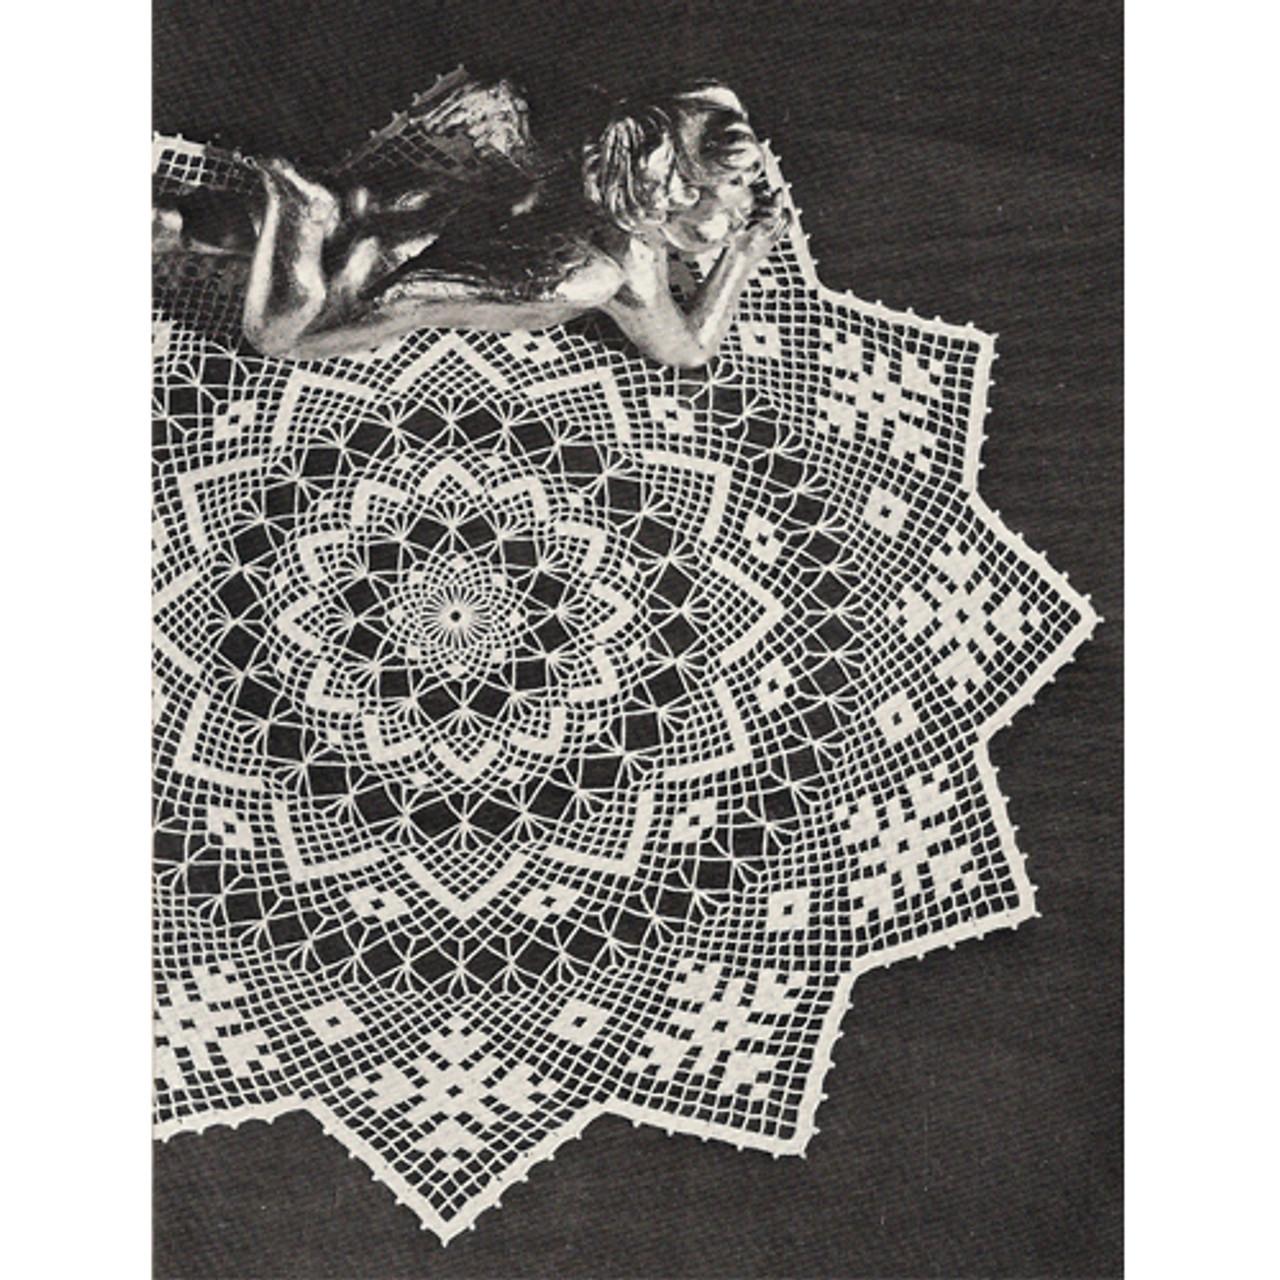 Crocheted Netted Doily Crochet Pattern